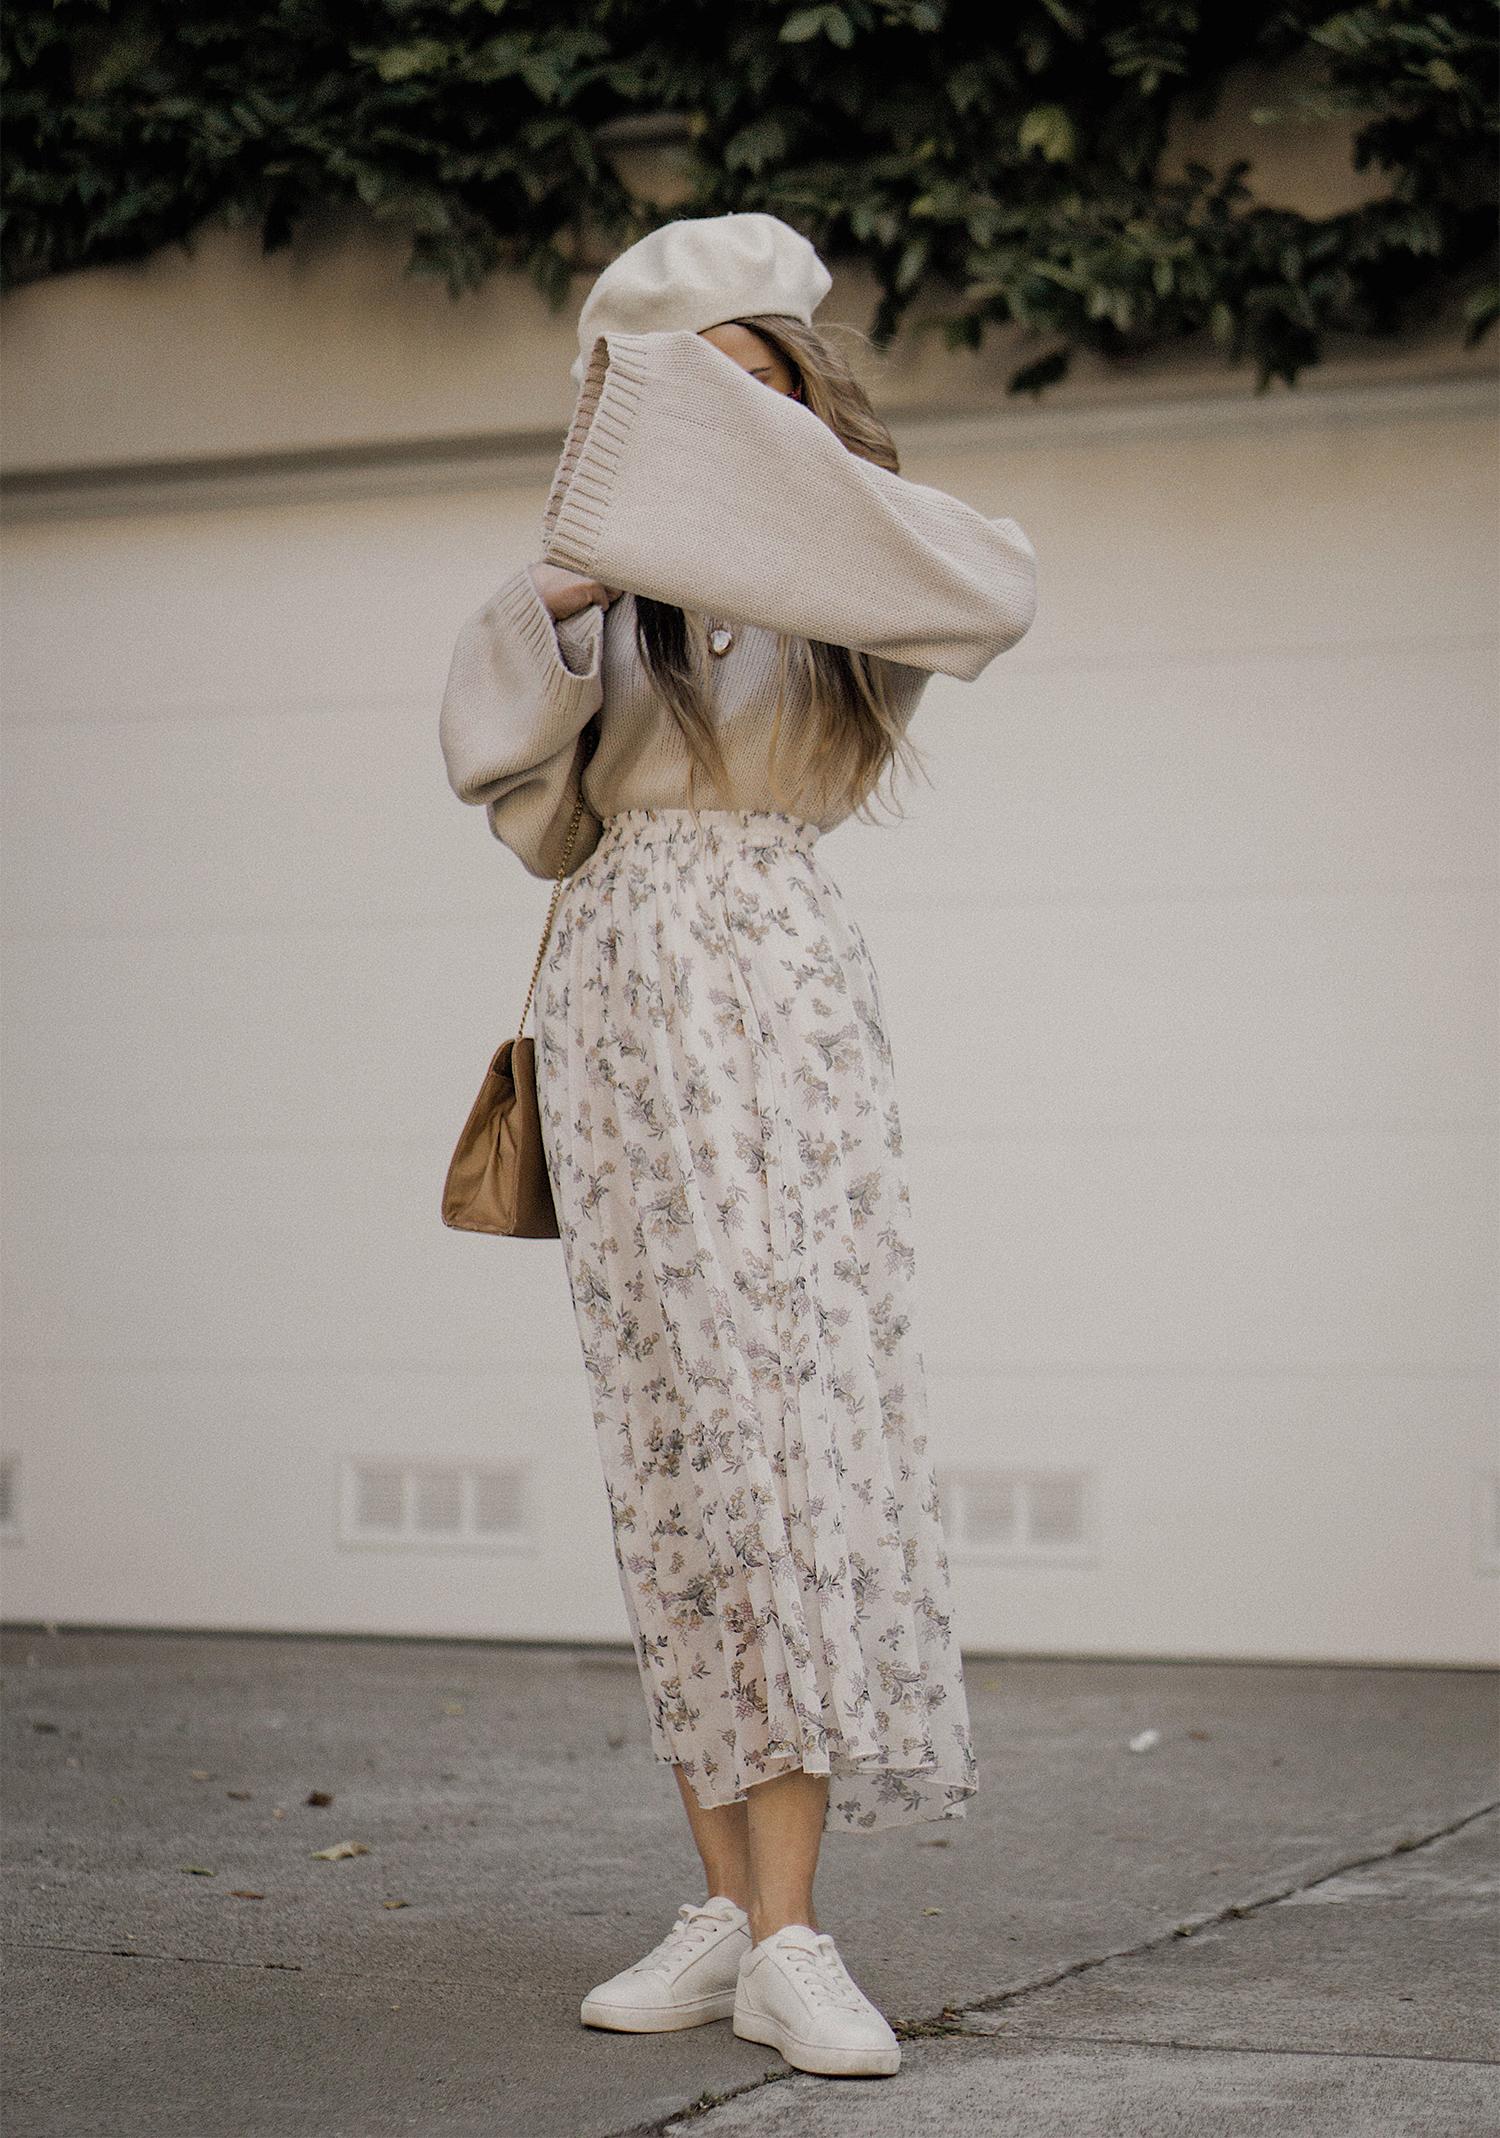 neutral_outfit_street_style_look_beige_tobi_sweater_long_skirt_romantic_beret_sneakers_vintage_lena_juice_the_white_ocean_01